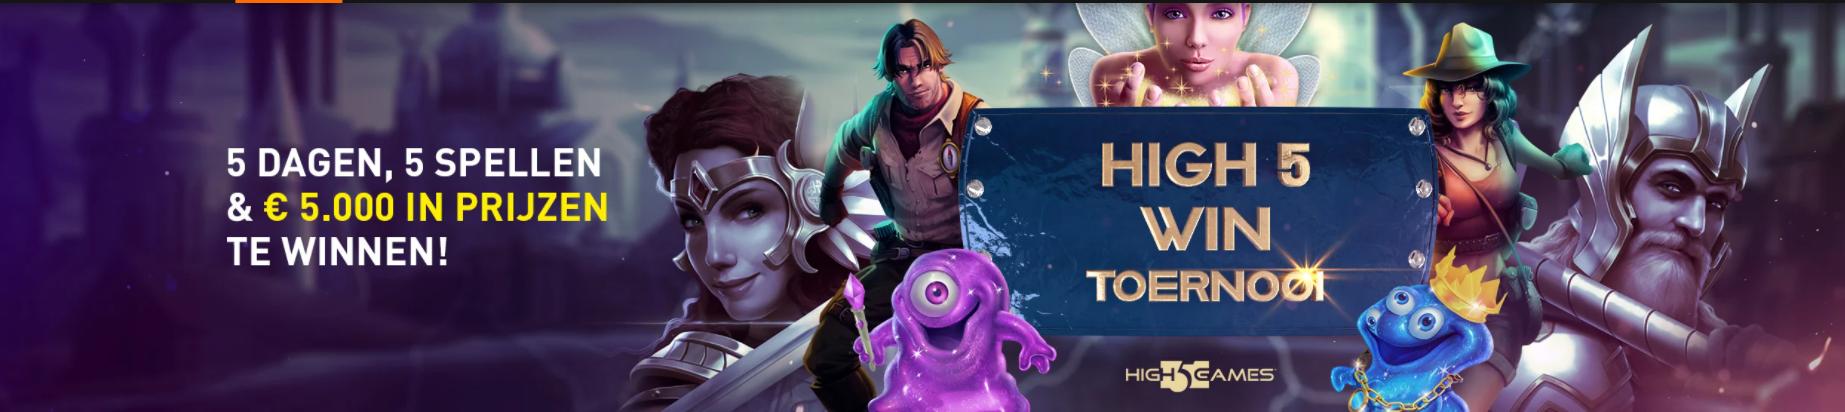 High Win Toernooi High 5 Games Online Casino 777 speelhal 1 miljoen Premium Coins